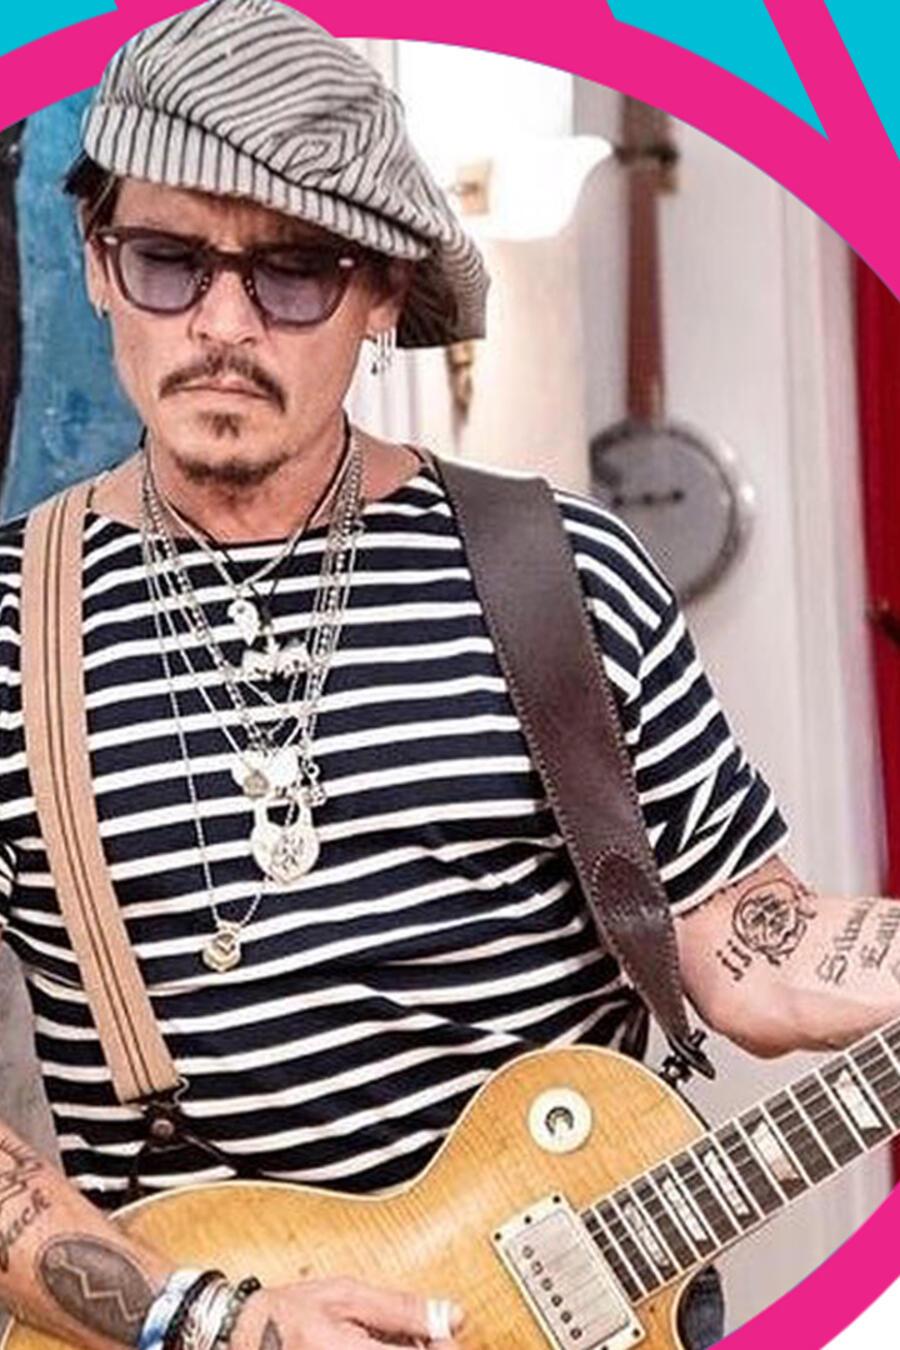 Johnny Depp helado foto